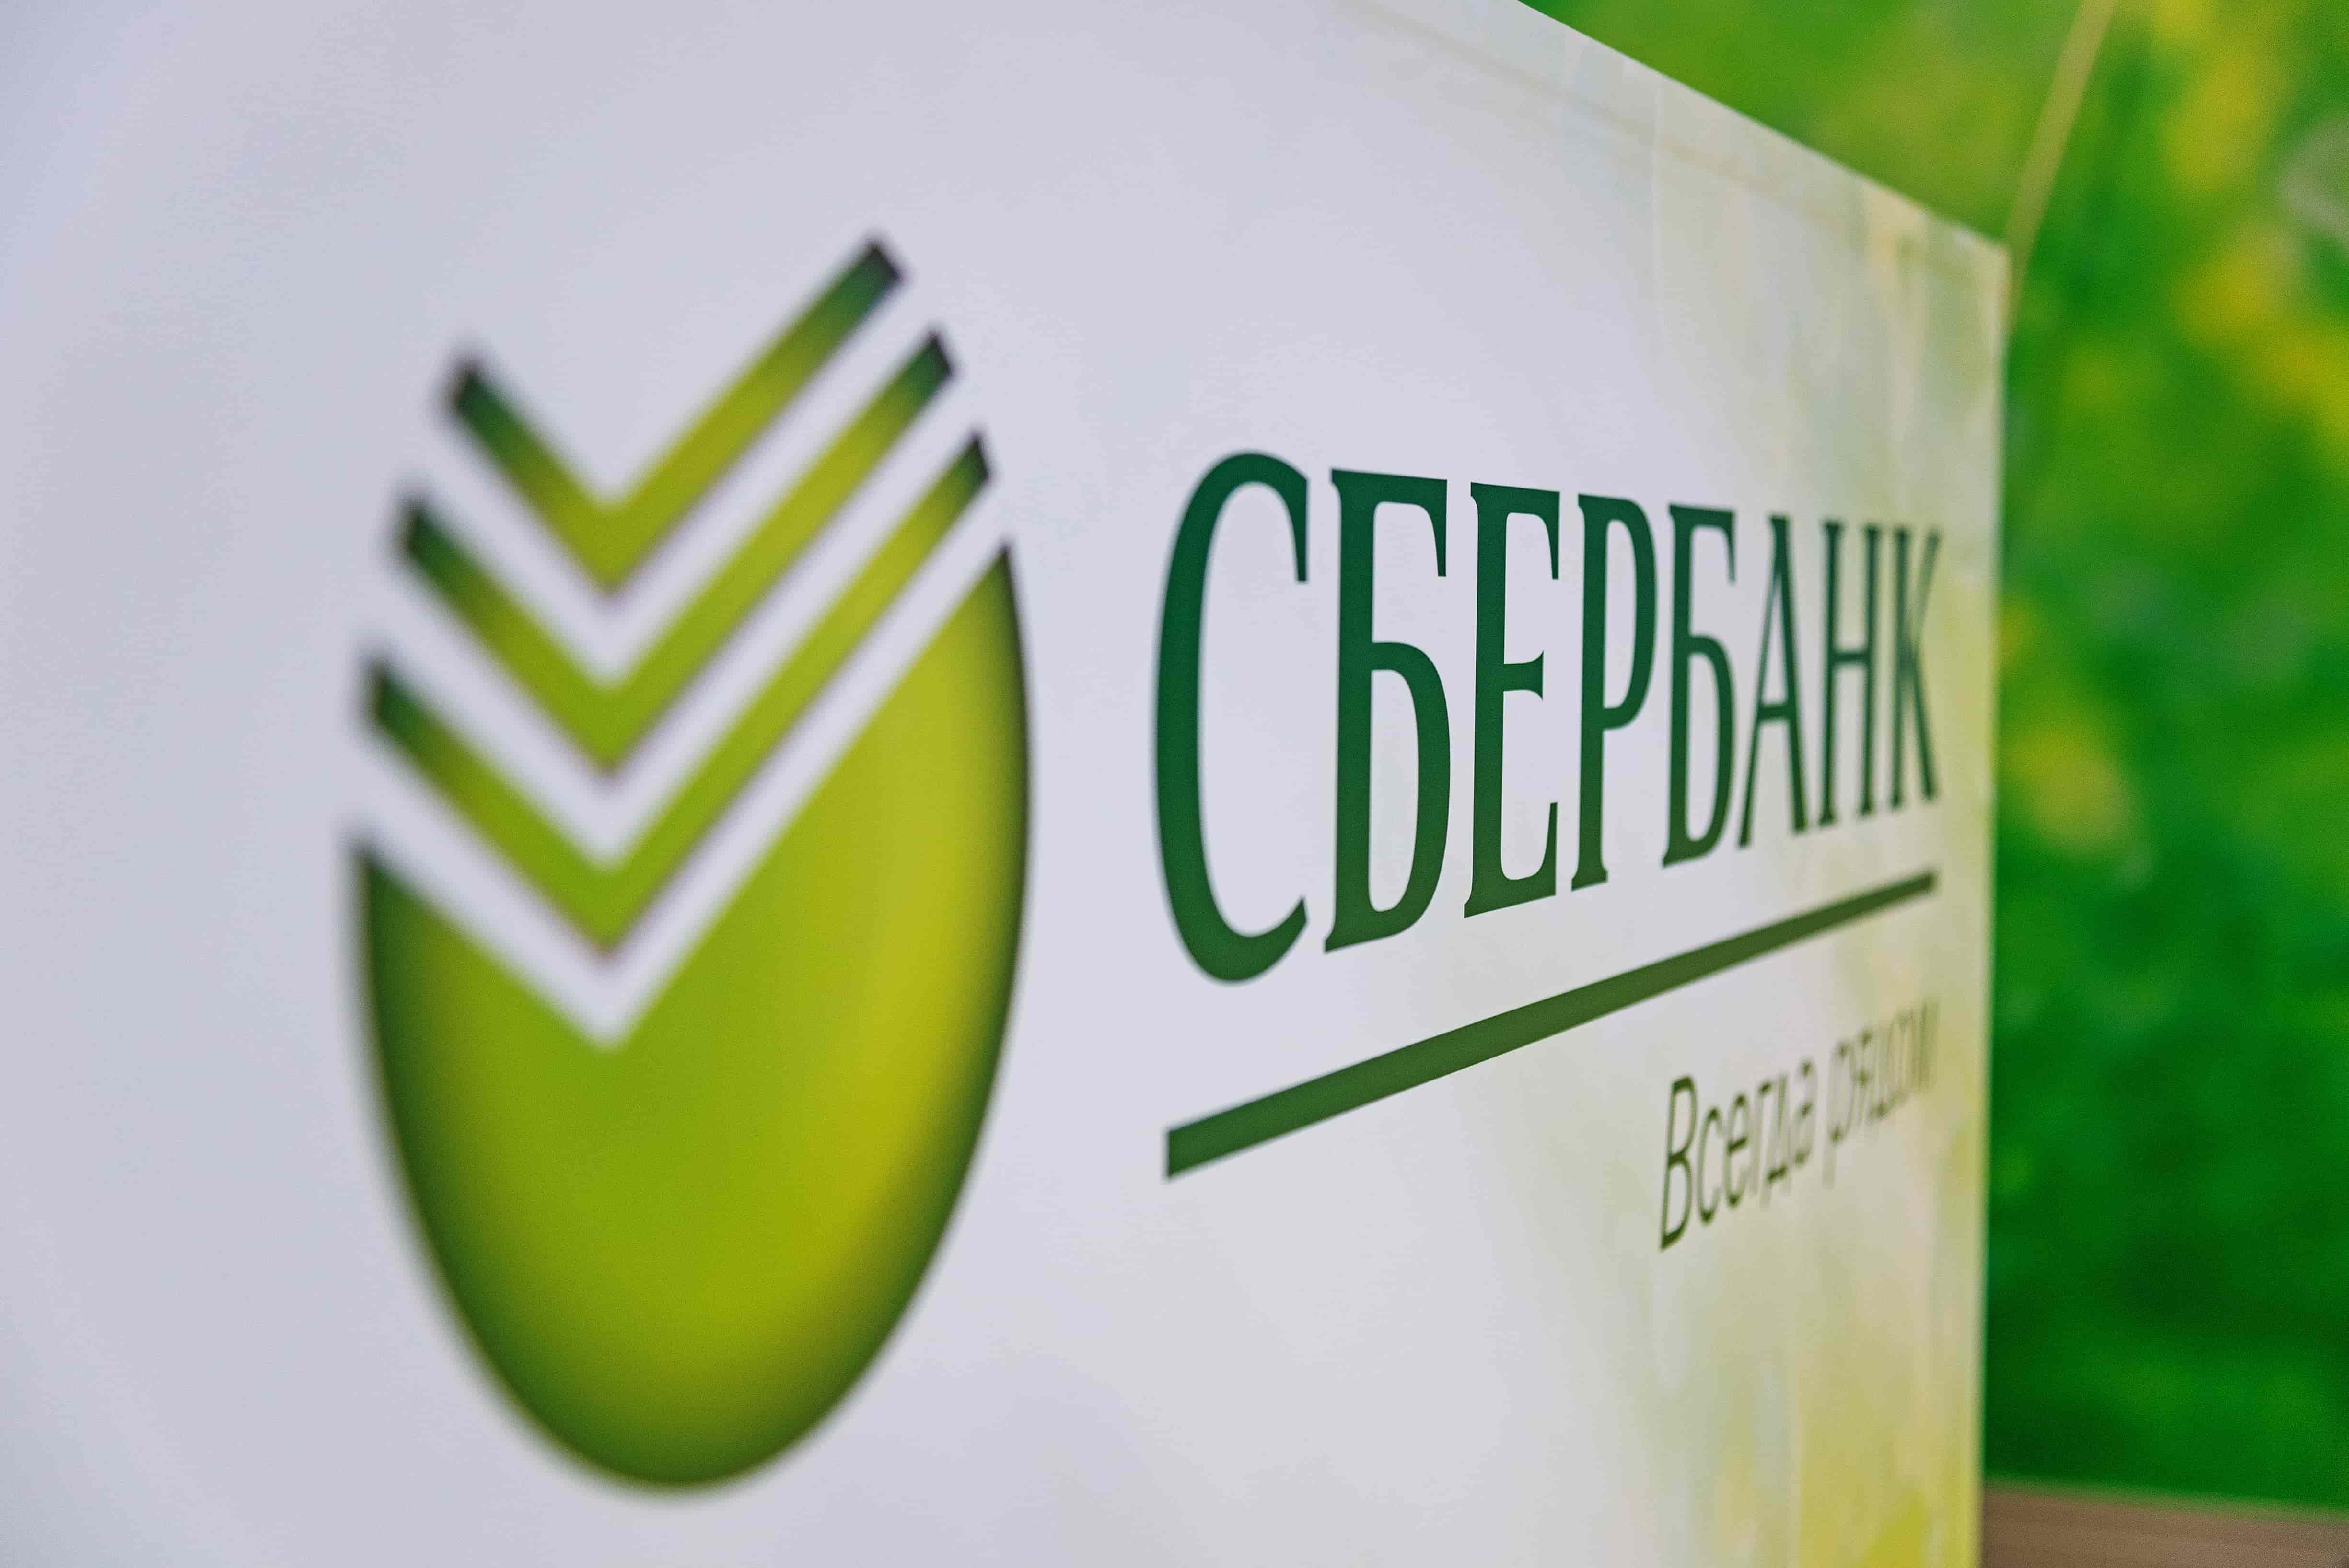 https://forex-images.mt5.com/russian_economy/5c13bde773a44.jpg